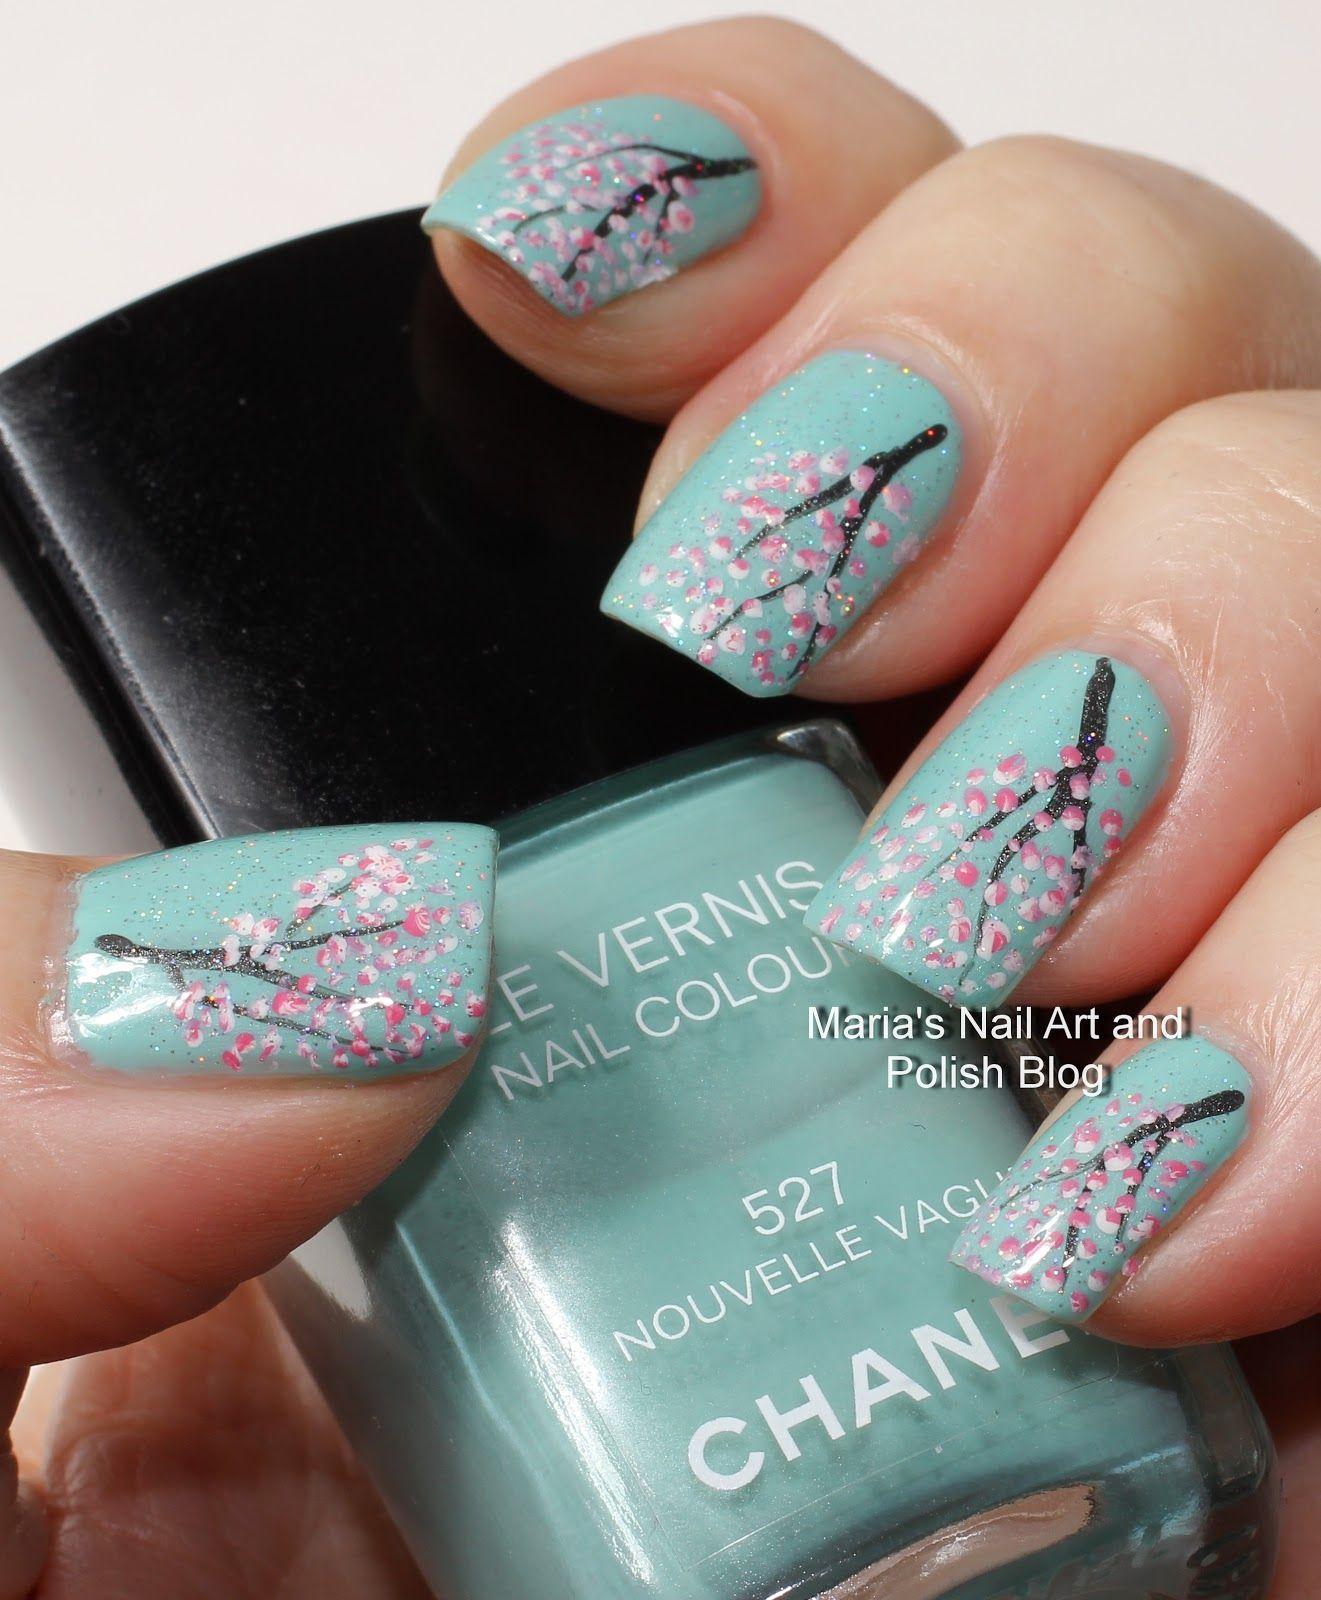 Marias Nail Art and Polish Blog: Cherry blossom nail art on Nouvelle Vague